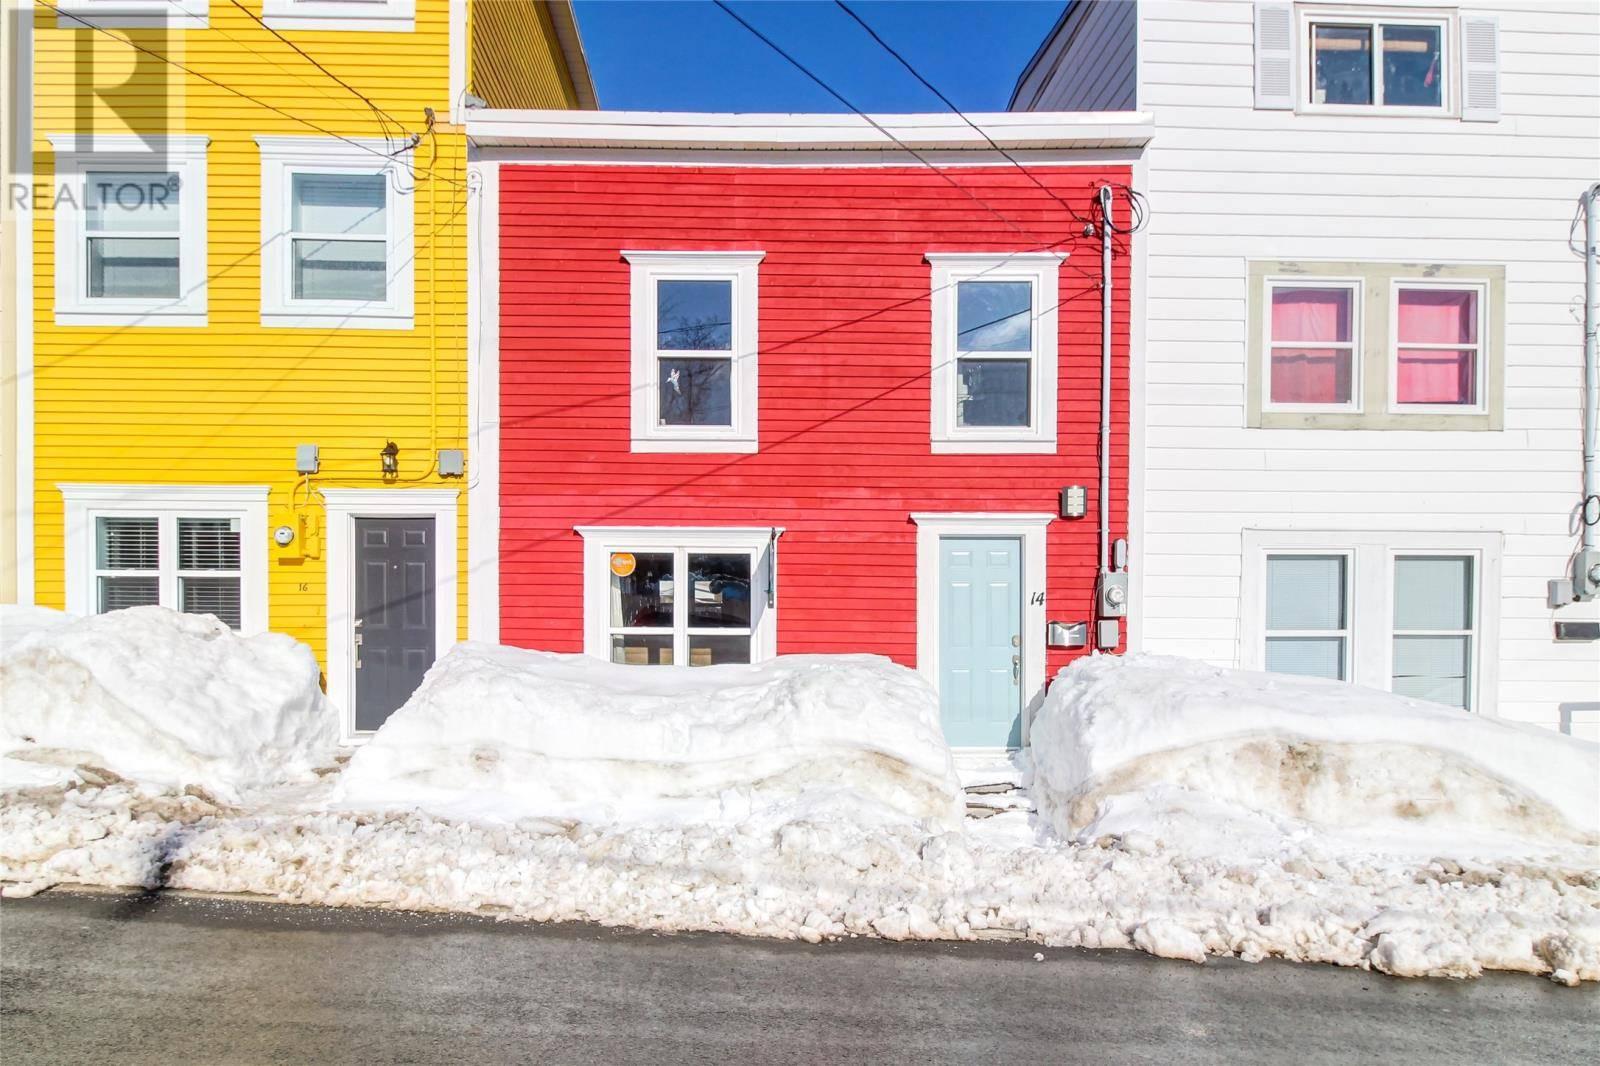 House for sale at 14 Hayward Ave St. John's Newfoundland - MLS: 1210066